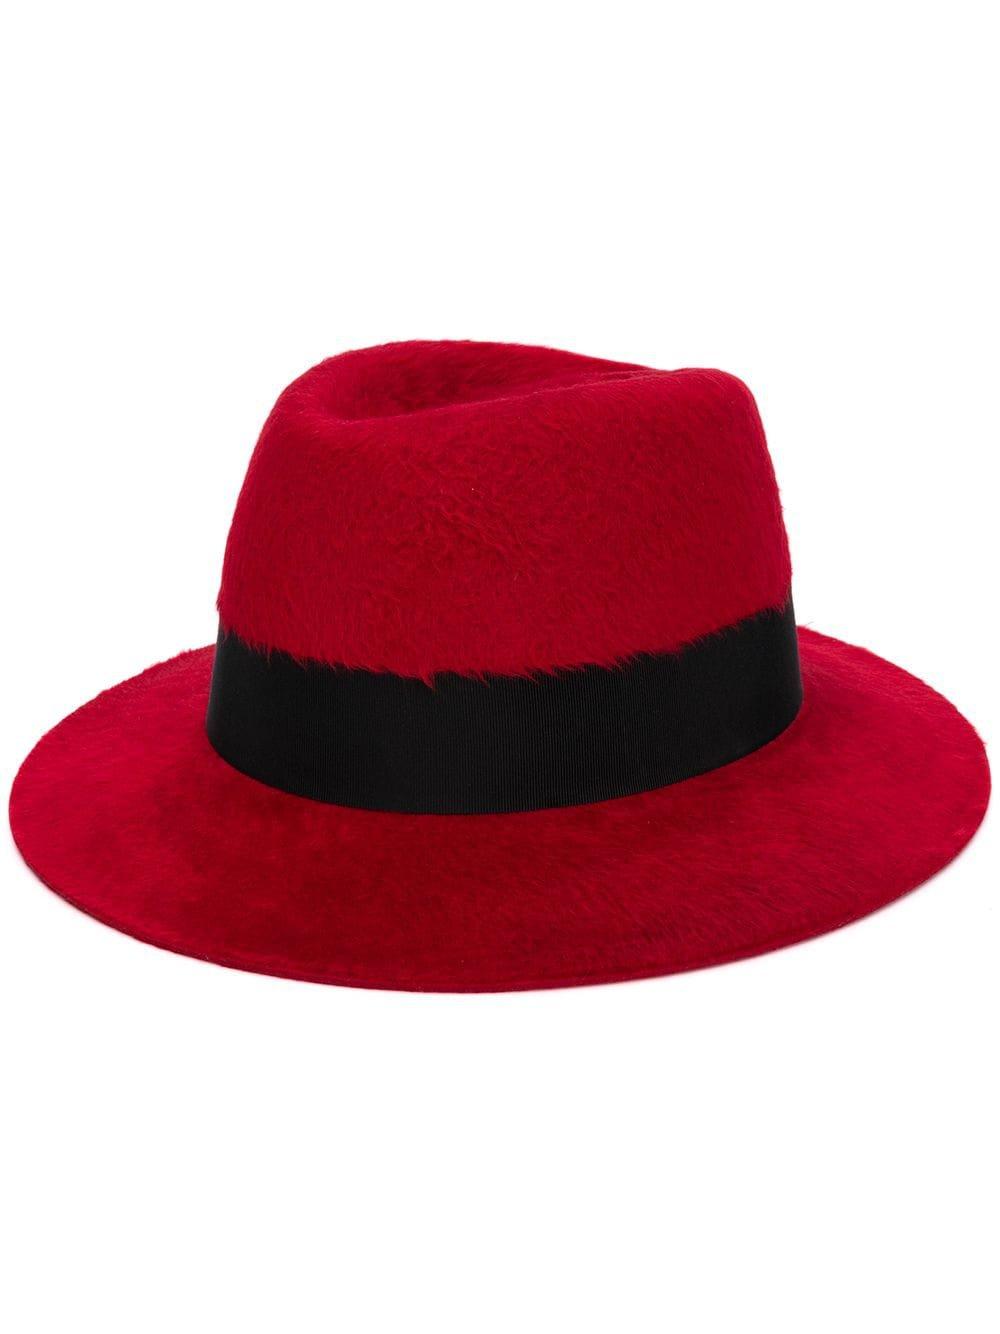 Saint Laurent Felt Fedora Hat | Farfetch.com